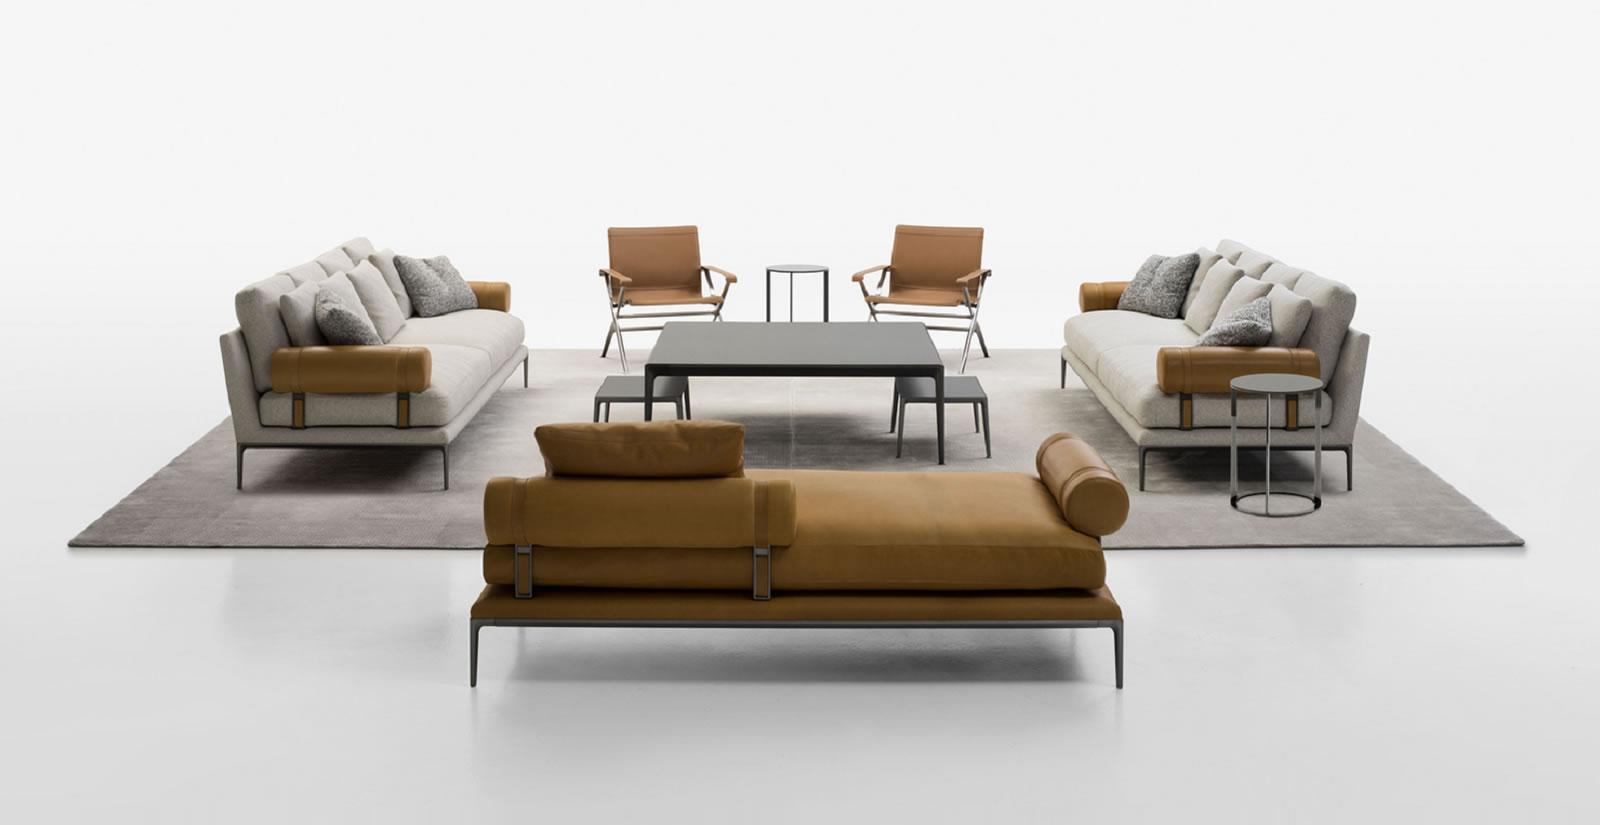 Atoll b b italia sofa atoll b b italia b b italia atoll for B b design